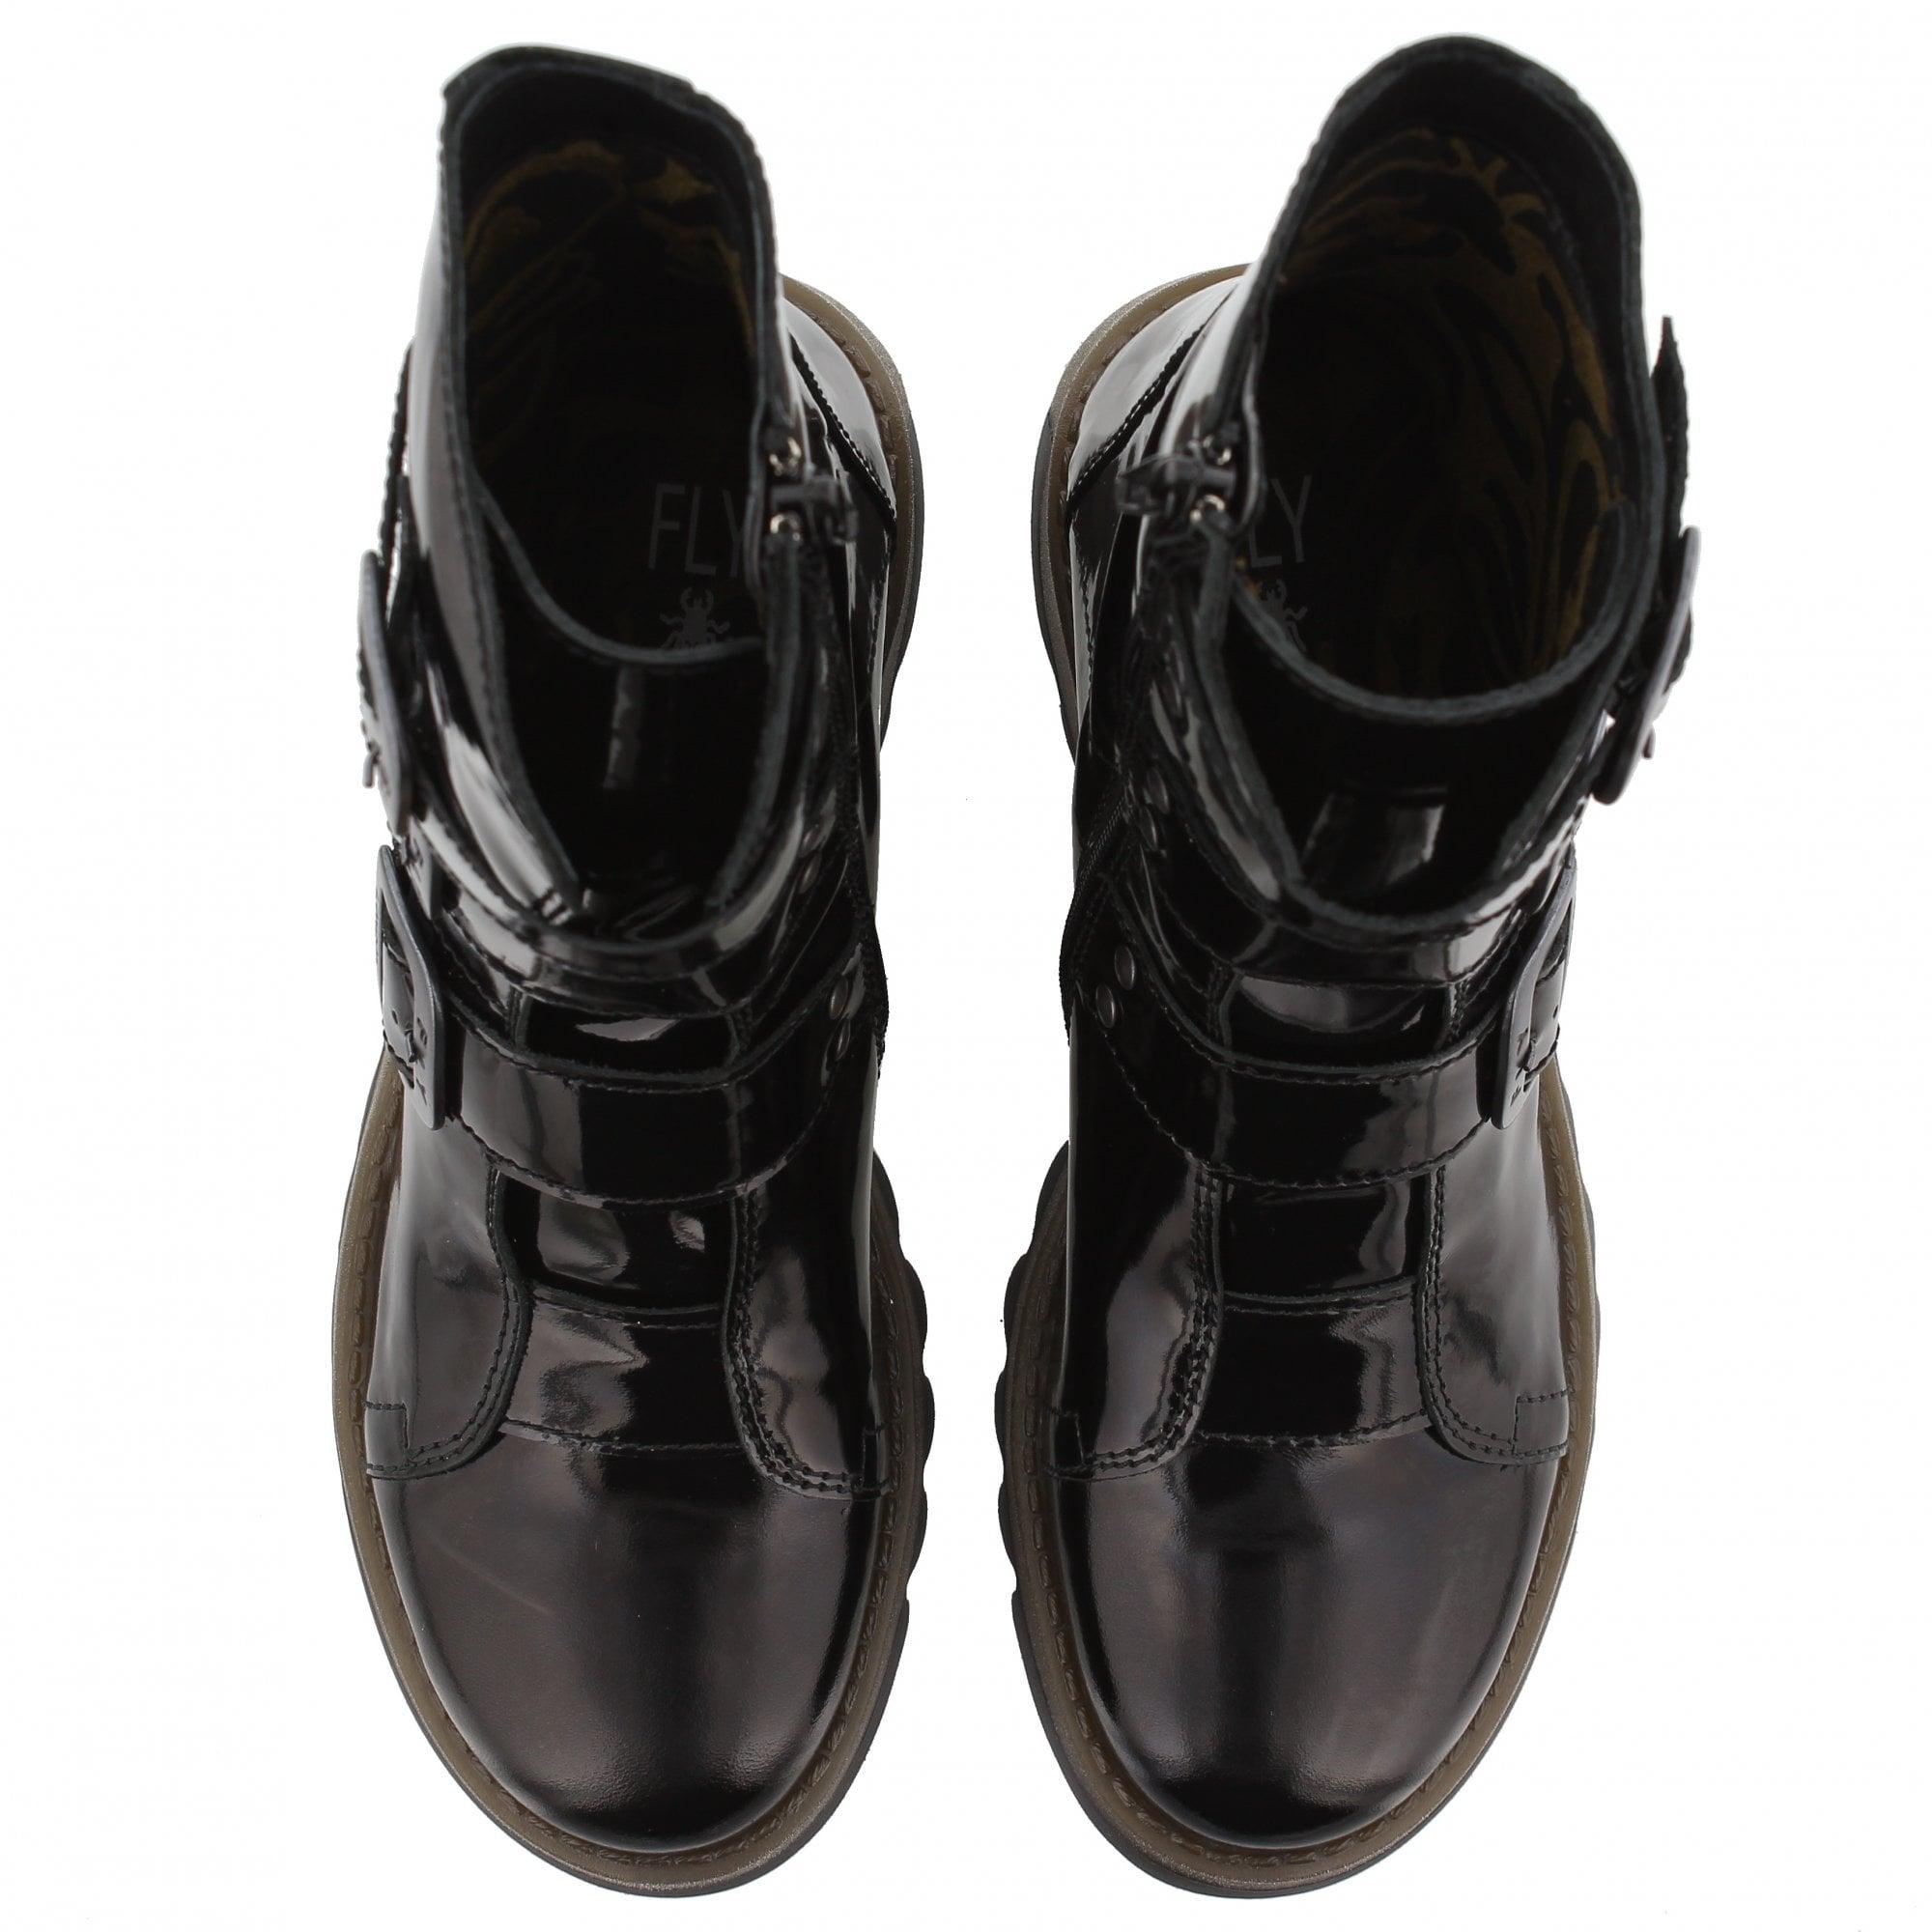 5b8781c7 Fly London Scop Ankle Boots Black Patent | Rogerson Shoes